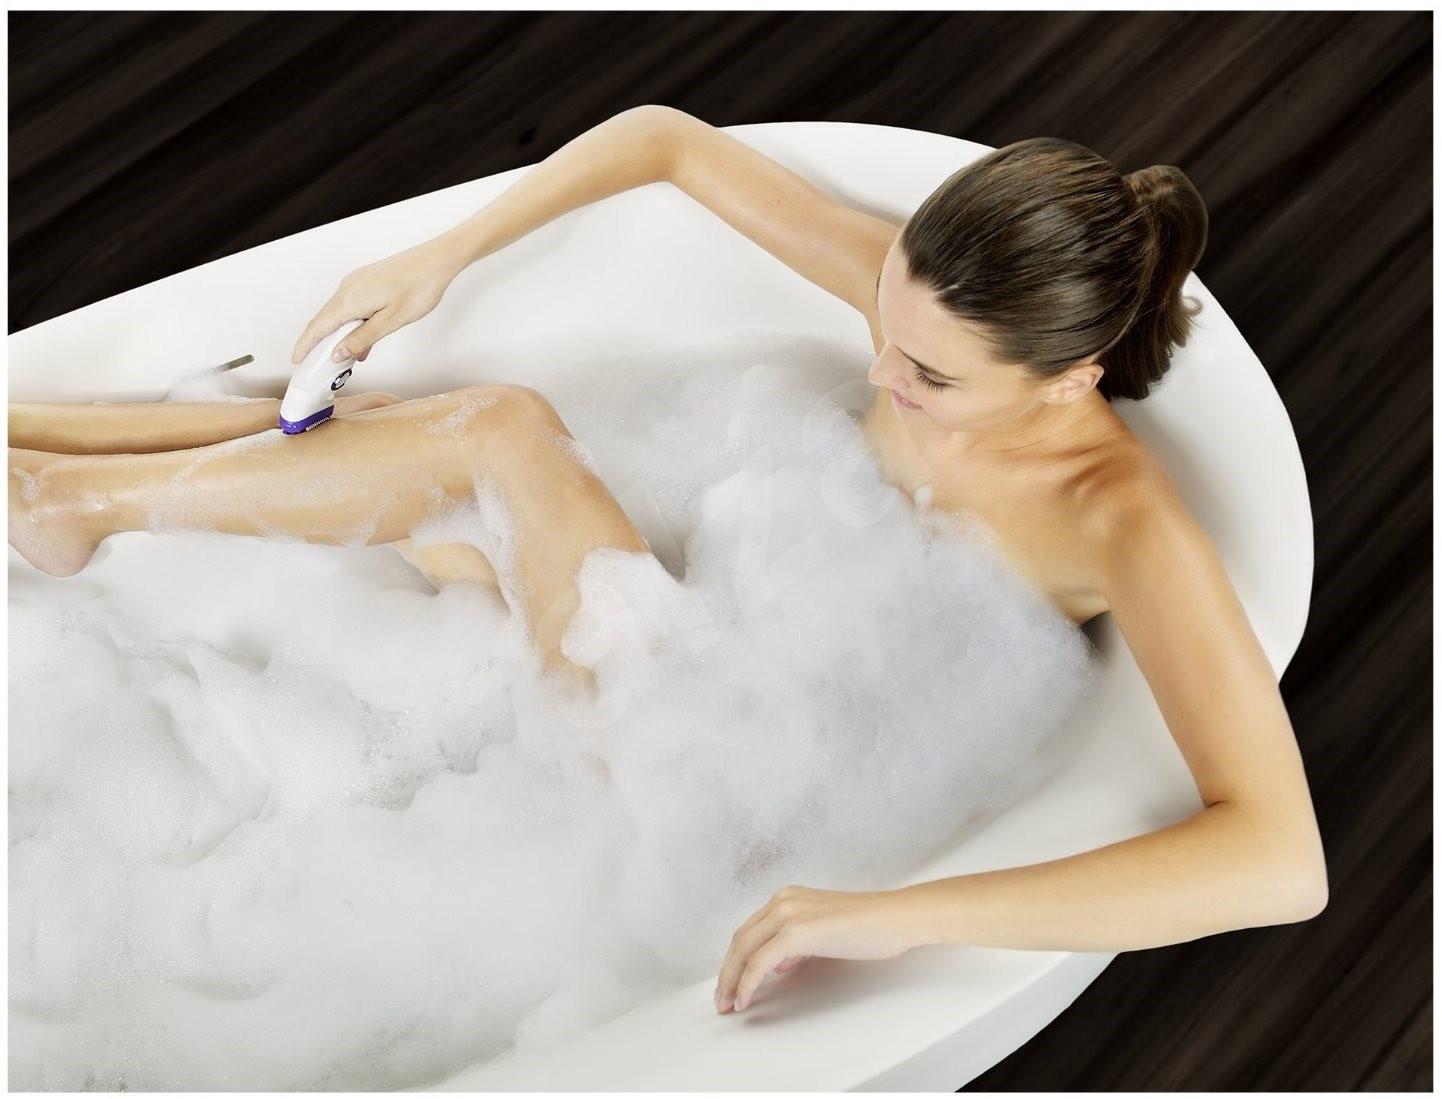 braun silk pil 9 9 561 wet dry epilator. Black Bedroom Furniture Sets. Home Design Ideas